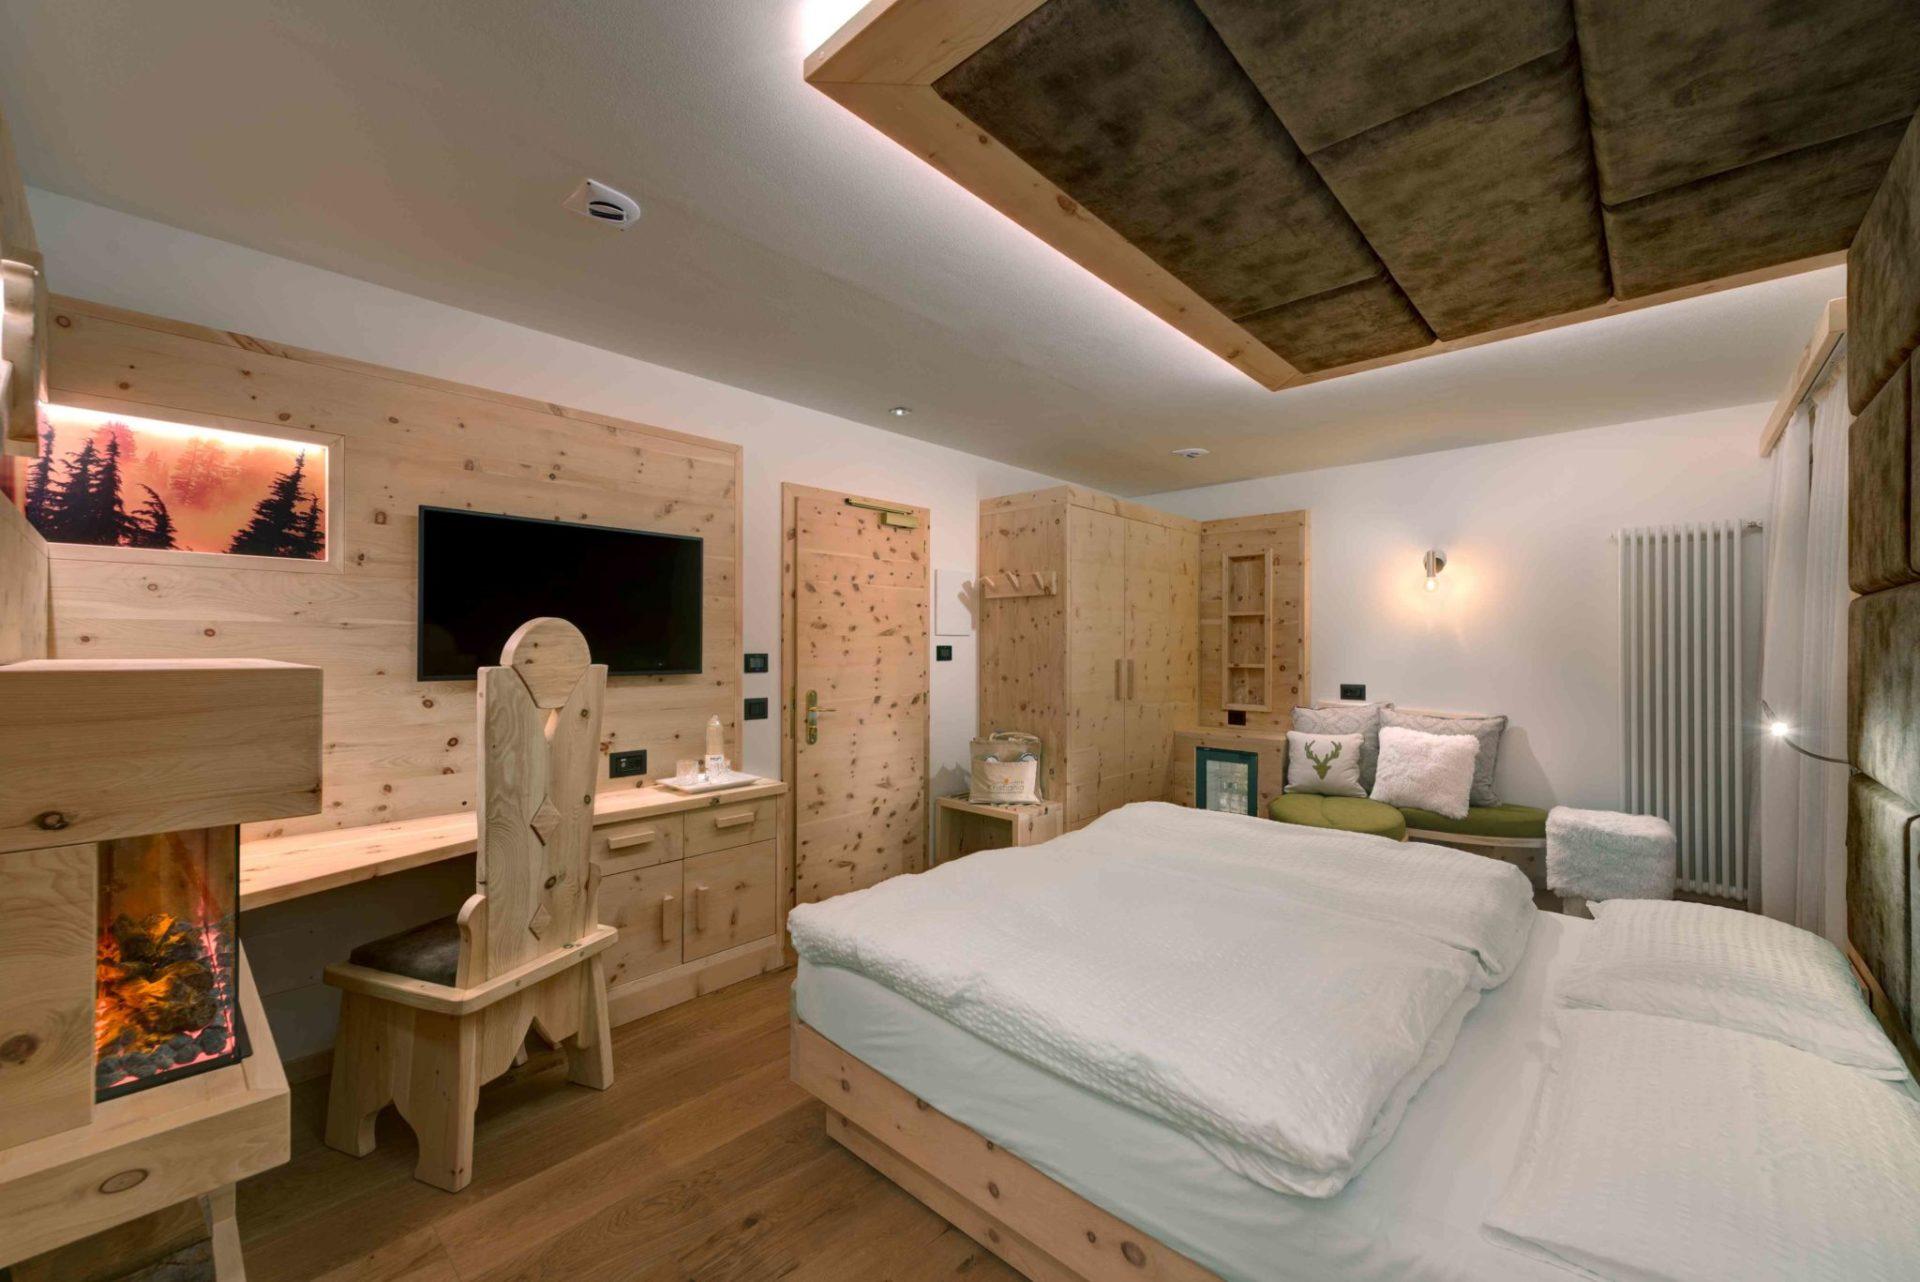 Immagine testata per Heavenly rest in our hotel rooms in Val di Sole